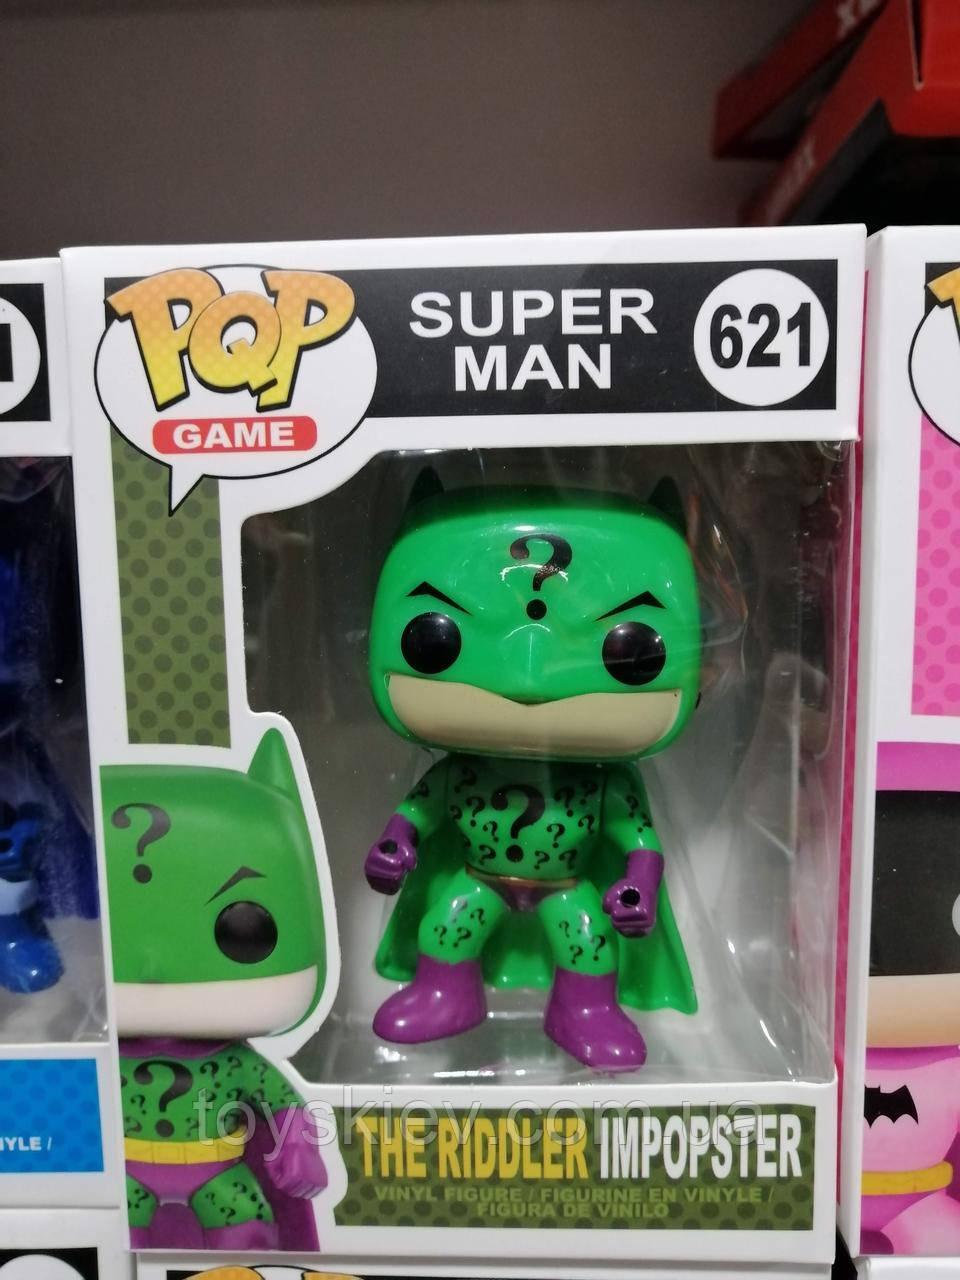 Фигурка Funko Pop Фанко Поп из серии Супер мен, Super Man, (аналог)